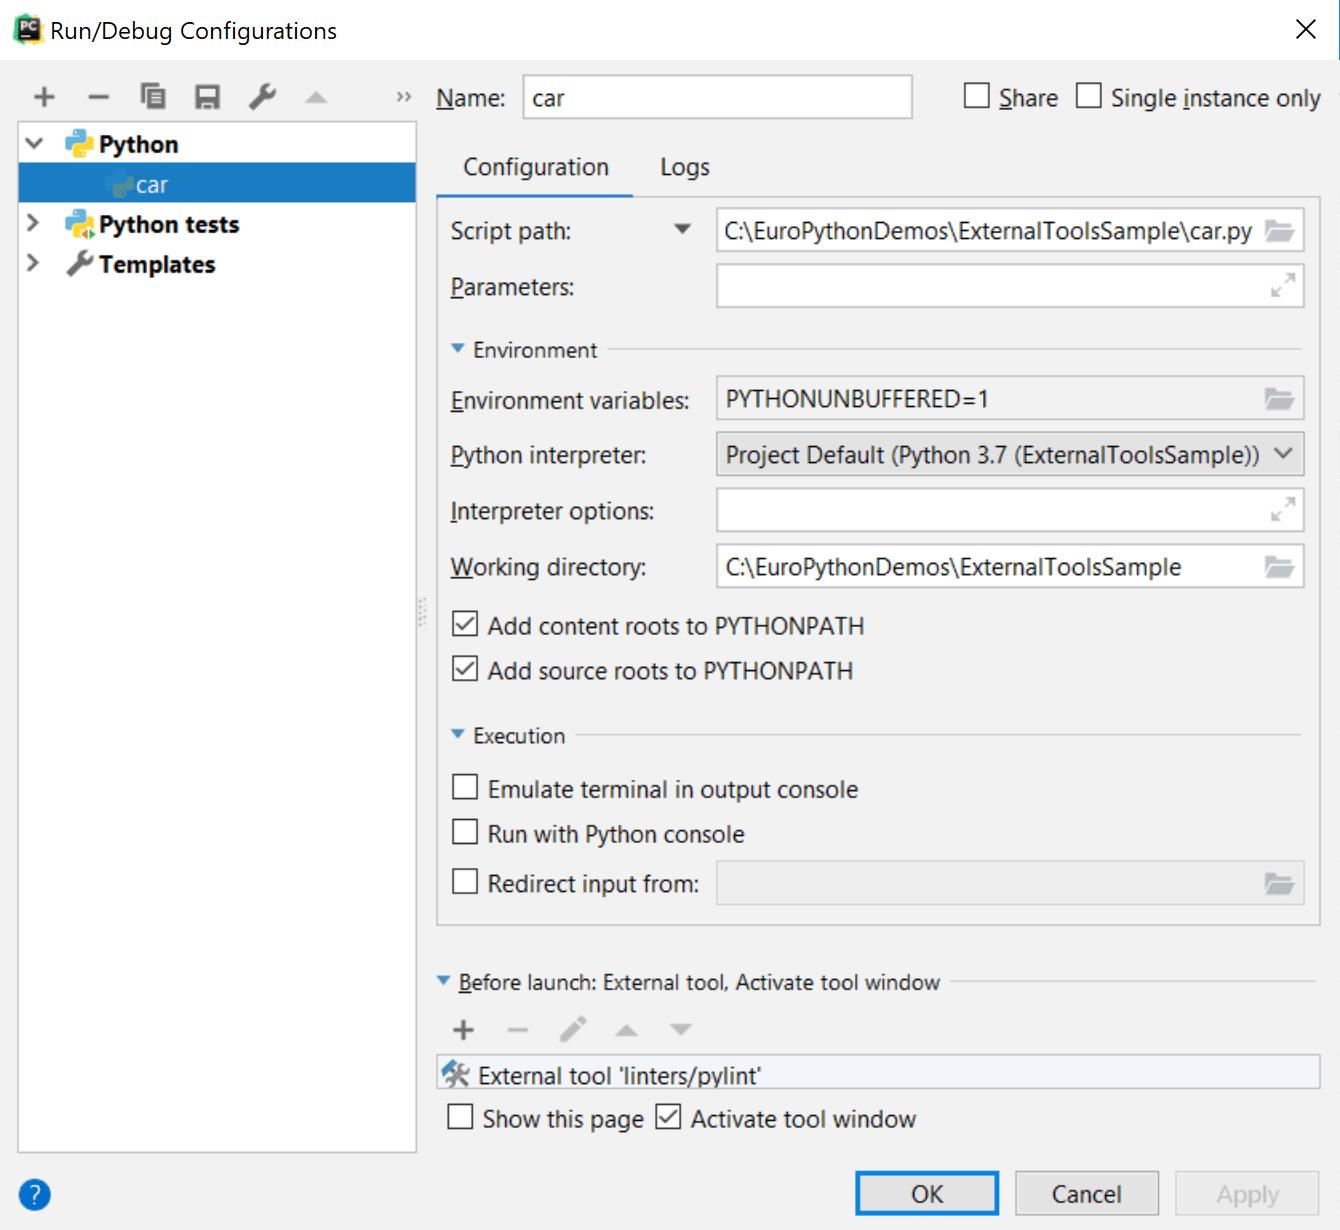 Adding pylint to the Run/Debug configuration